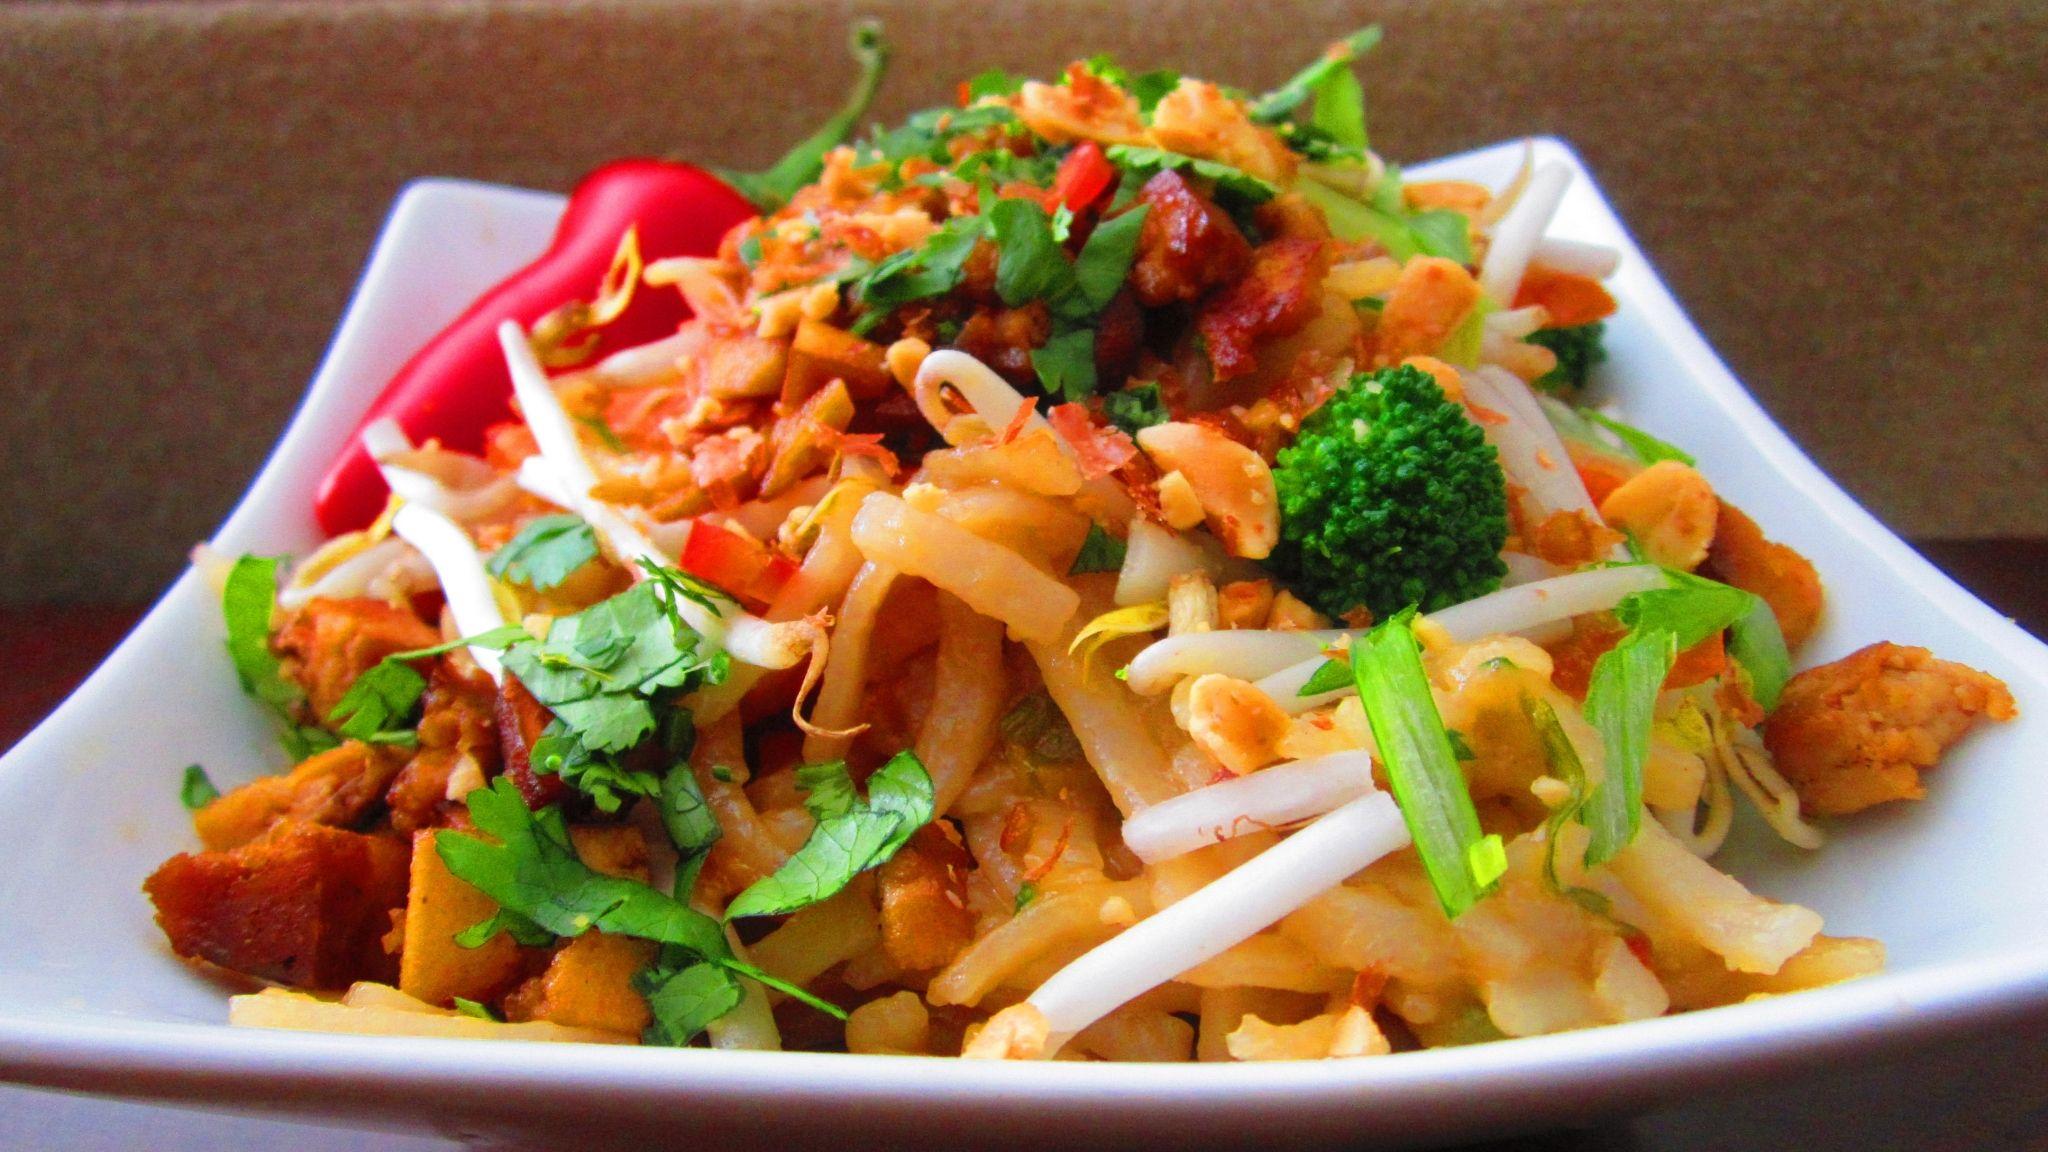 2048x1152 Food Ipad Wallpaper Retina Thailand Cuisine Thailand Food Thai Recipes